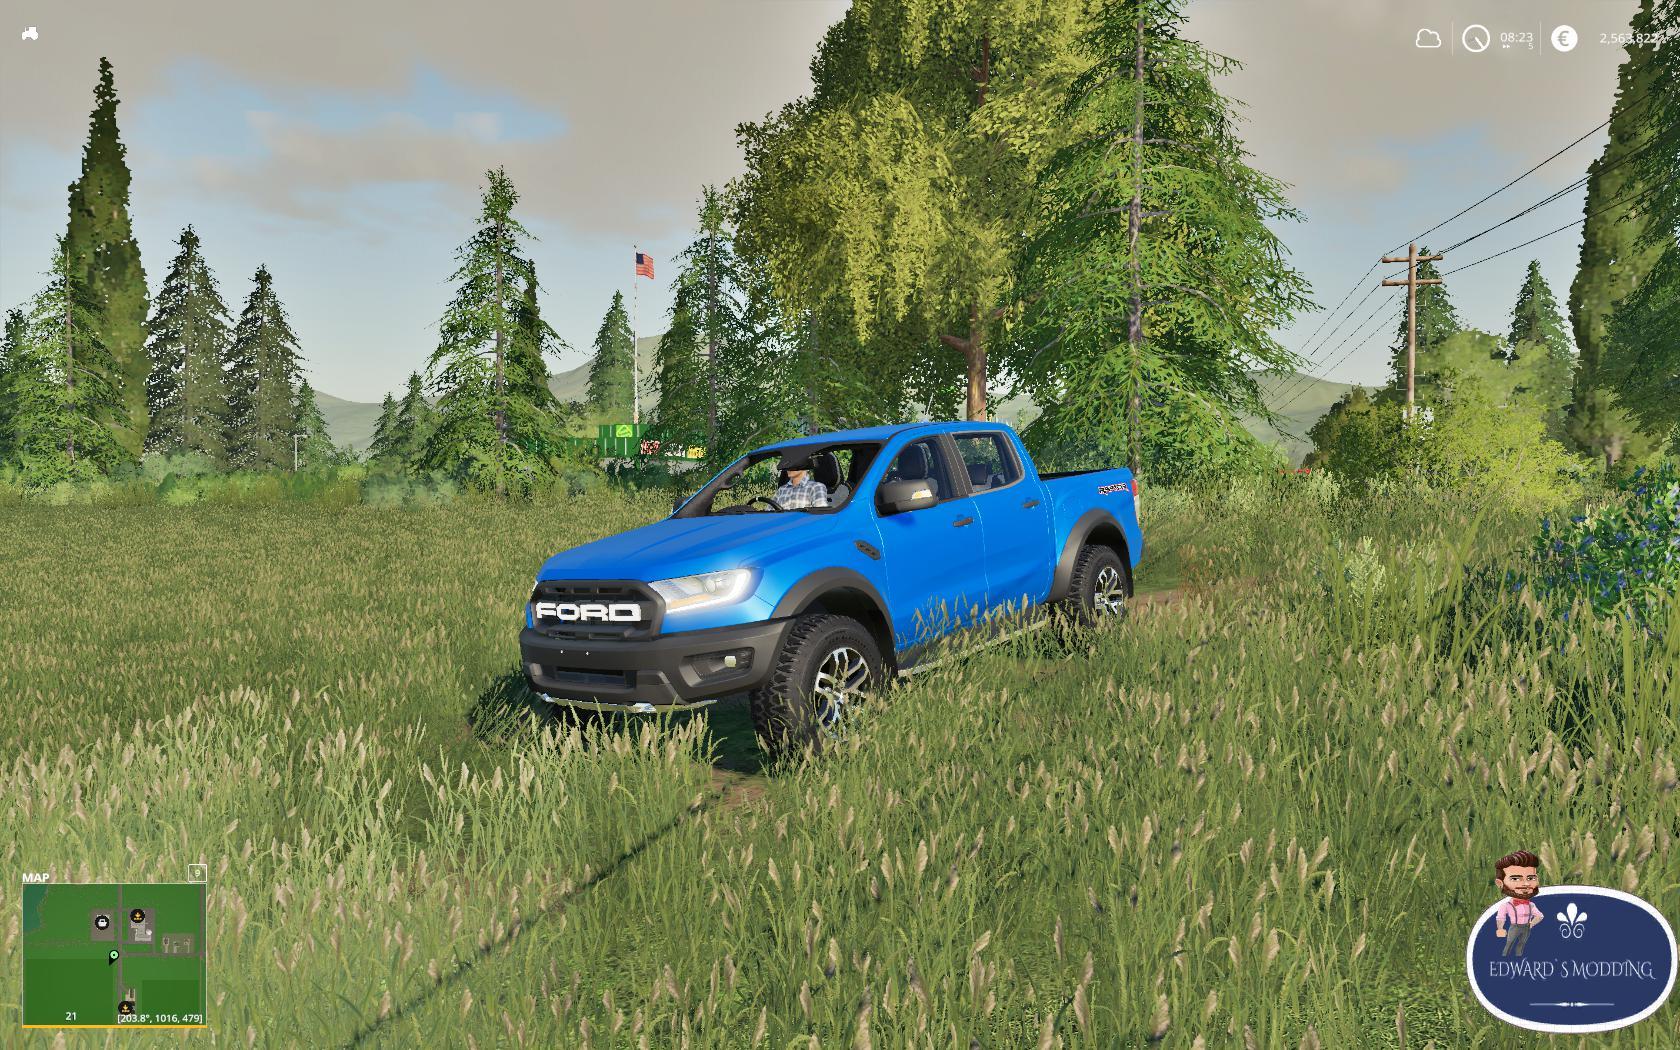 Ford Ranger Raptor 2019 Lhd Fs19 V1 1 Fs19 Mod Fs19 Net